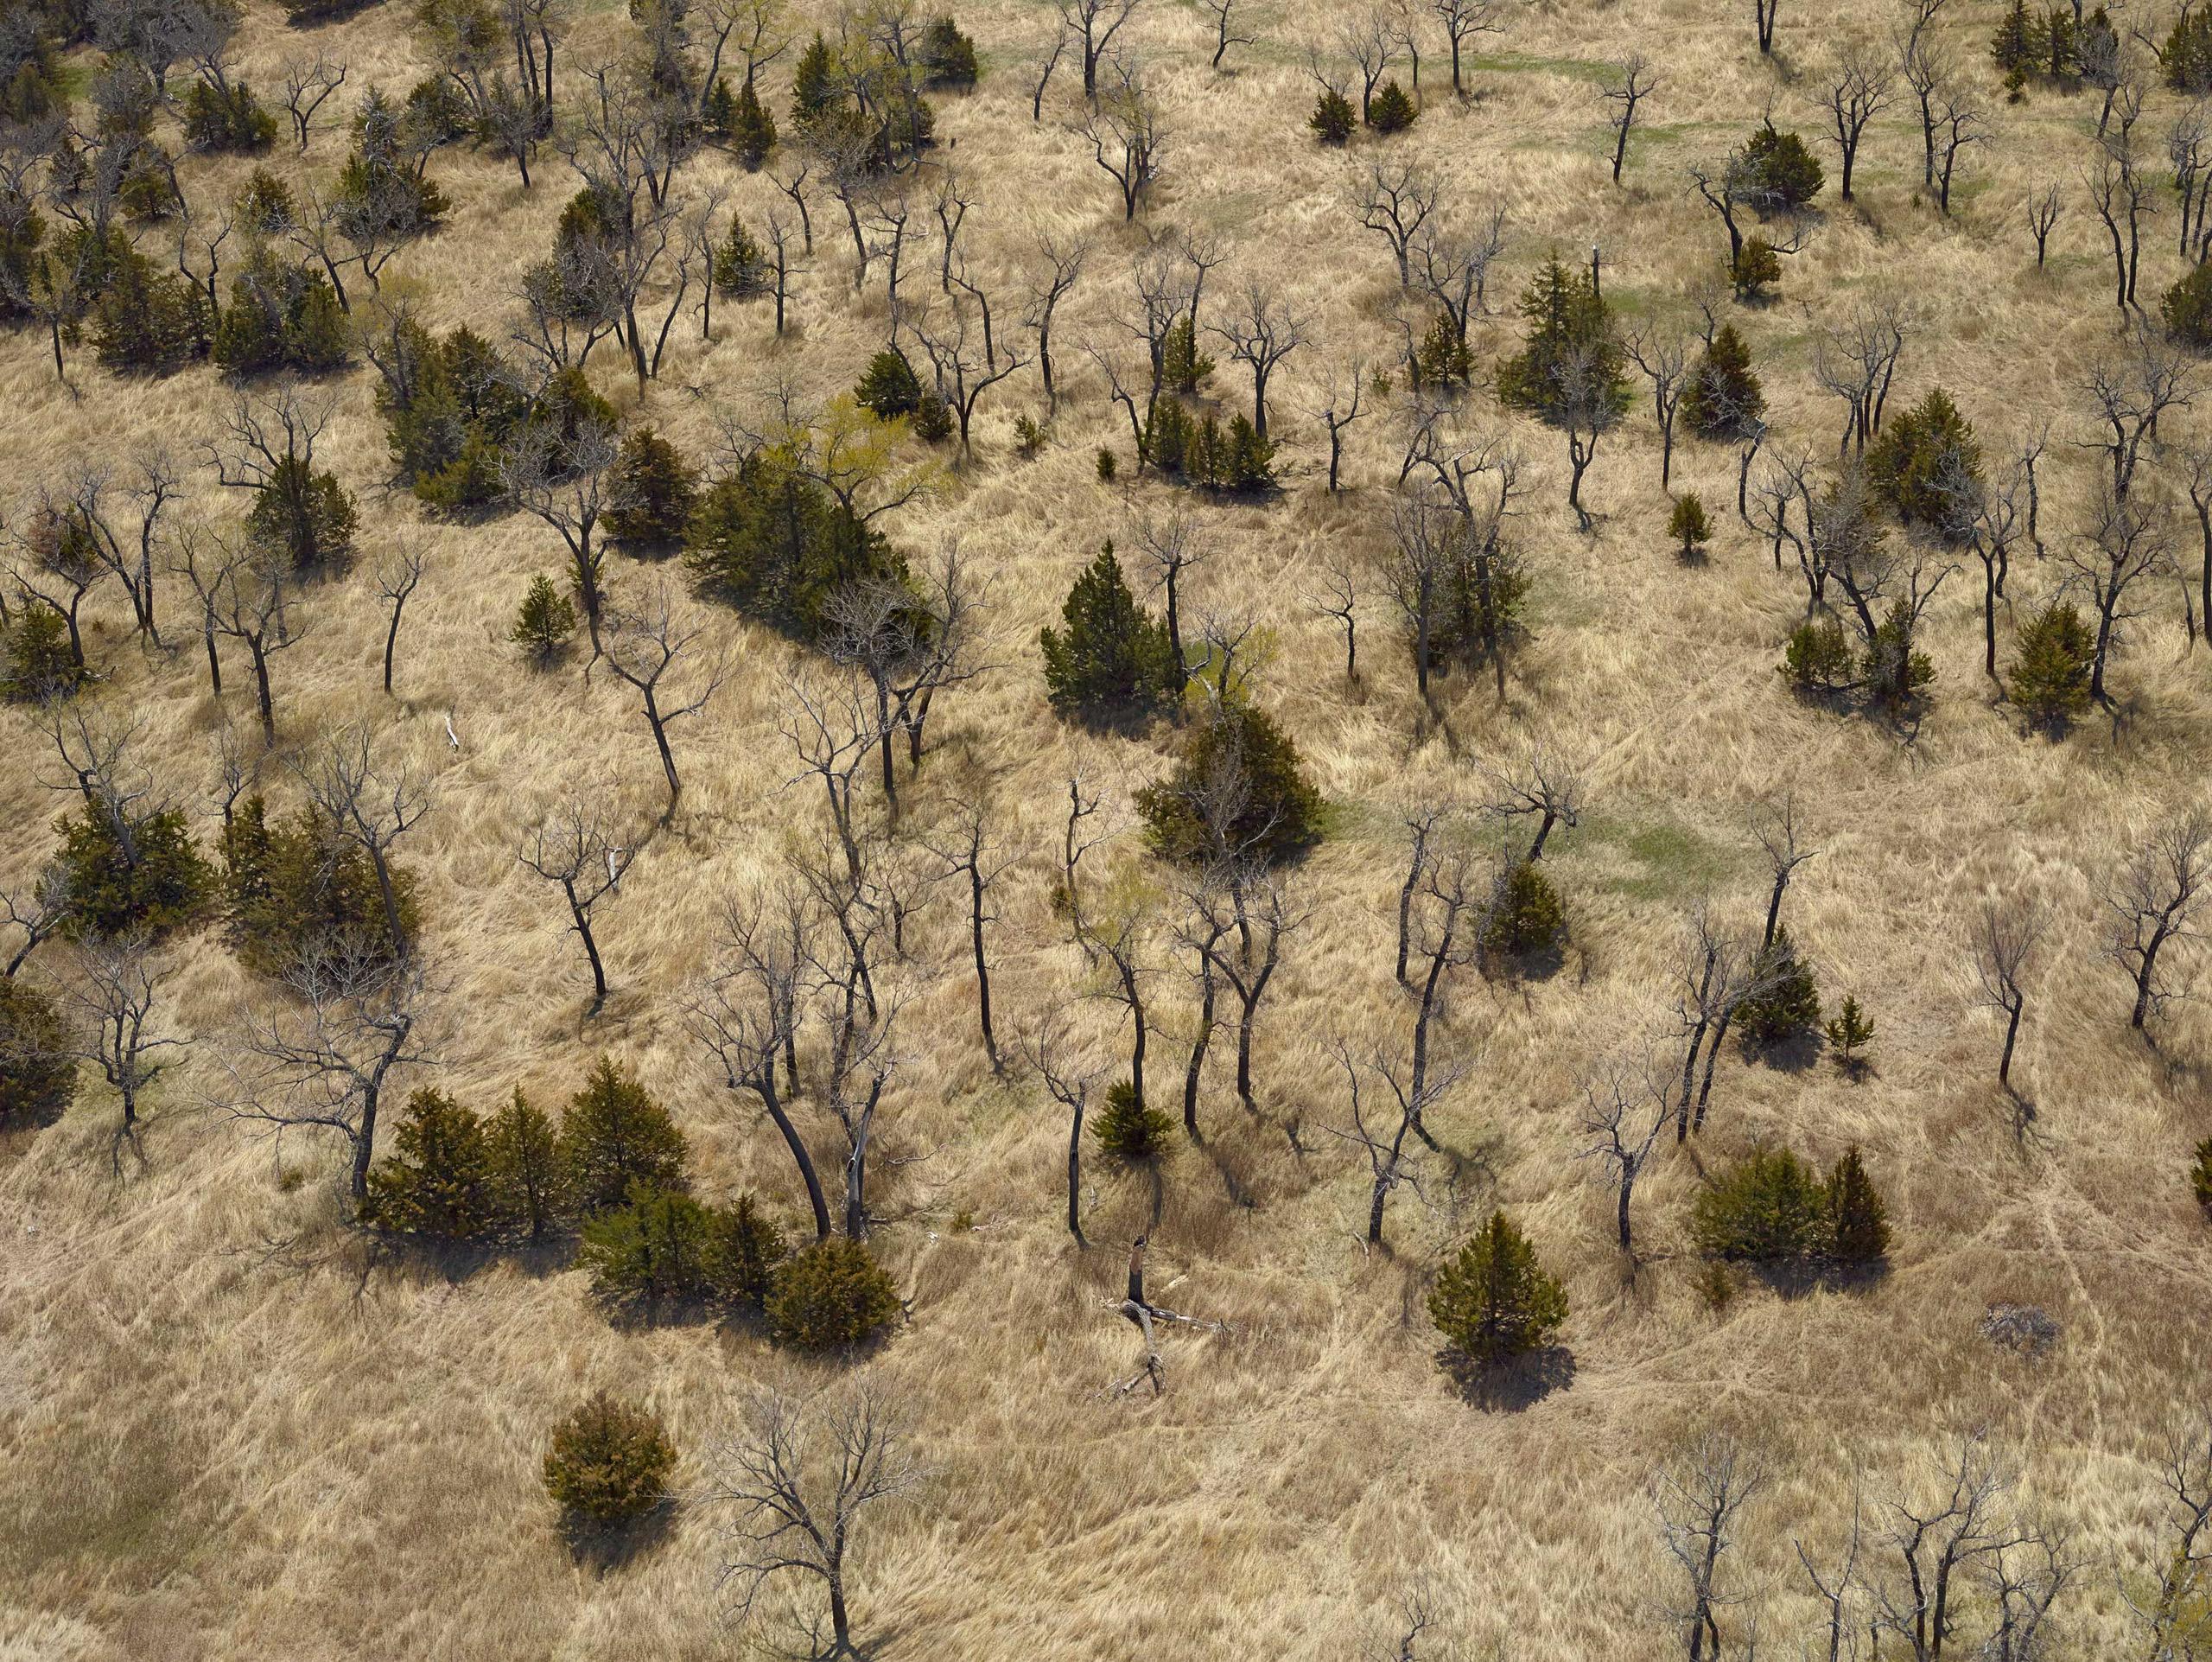 Along The Bad River. Haakon County, South Dakota, 2014.